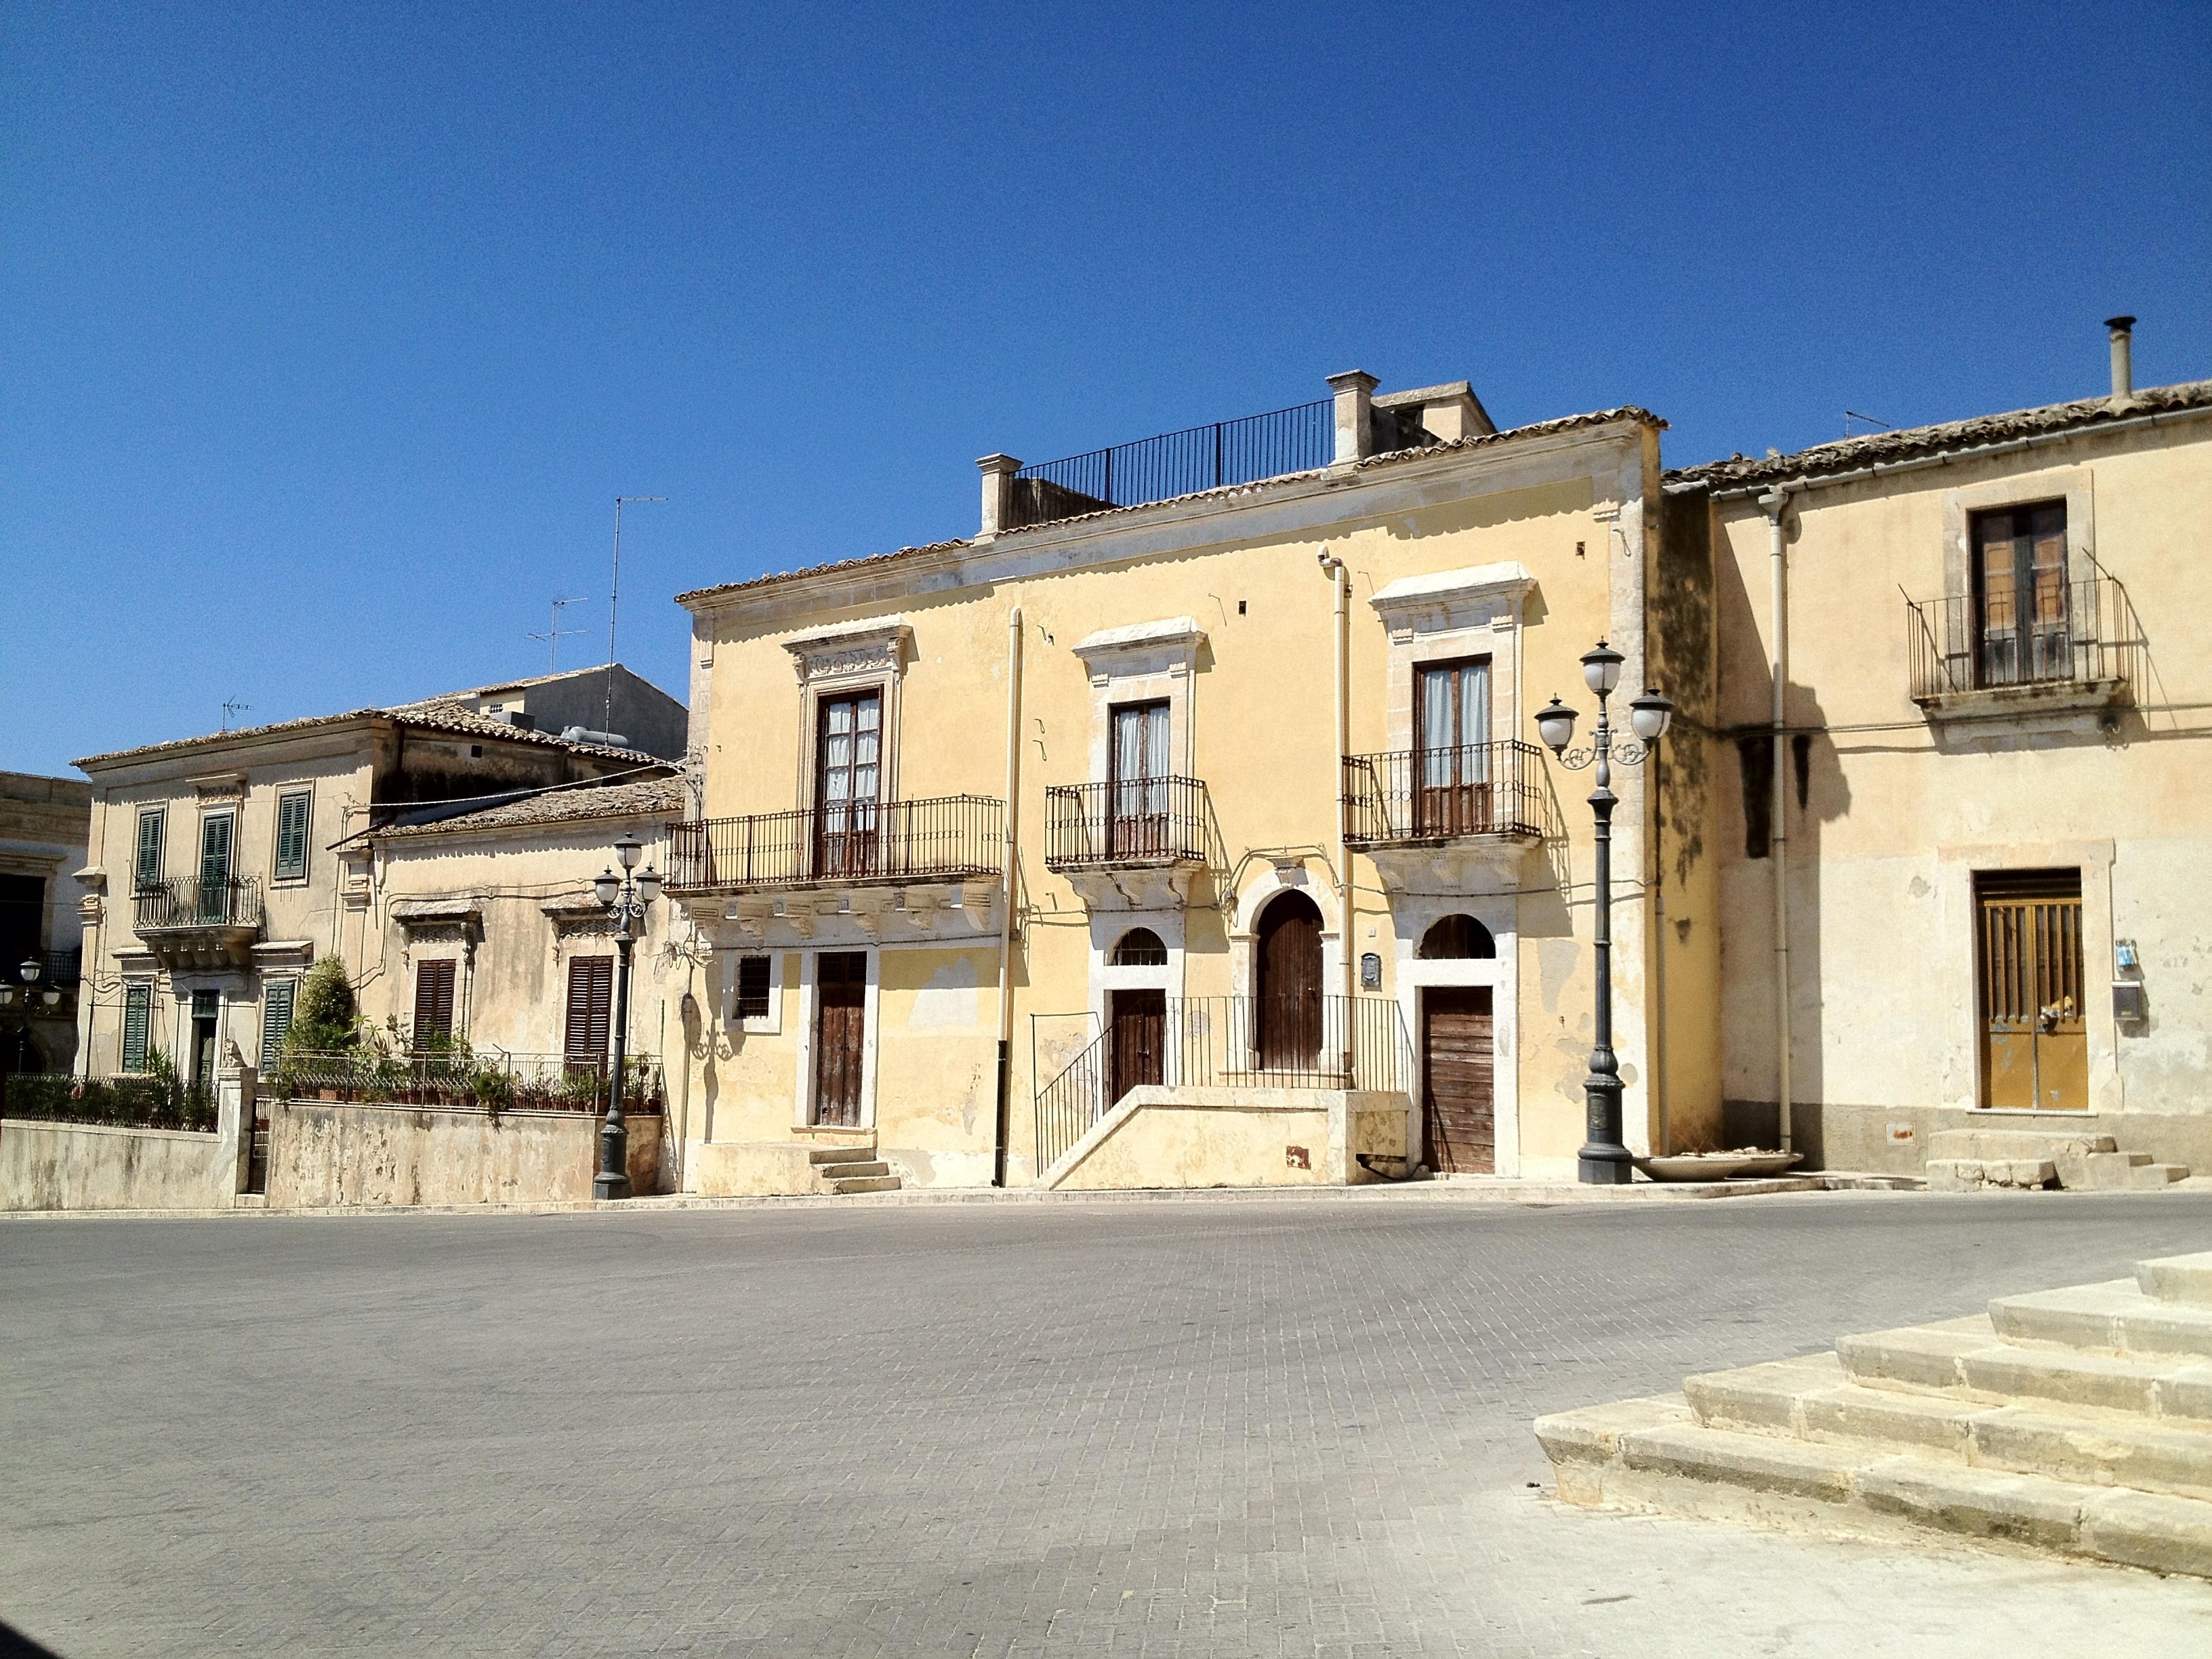 Ispica Italy  City new picture : ... , Ispica, Ragusa, Italy, Piazza s. Antonio | italy.realigro.com